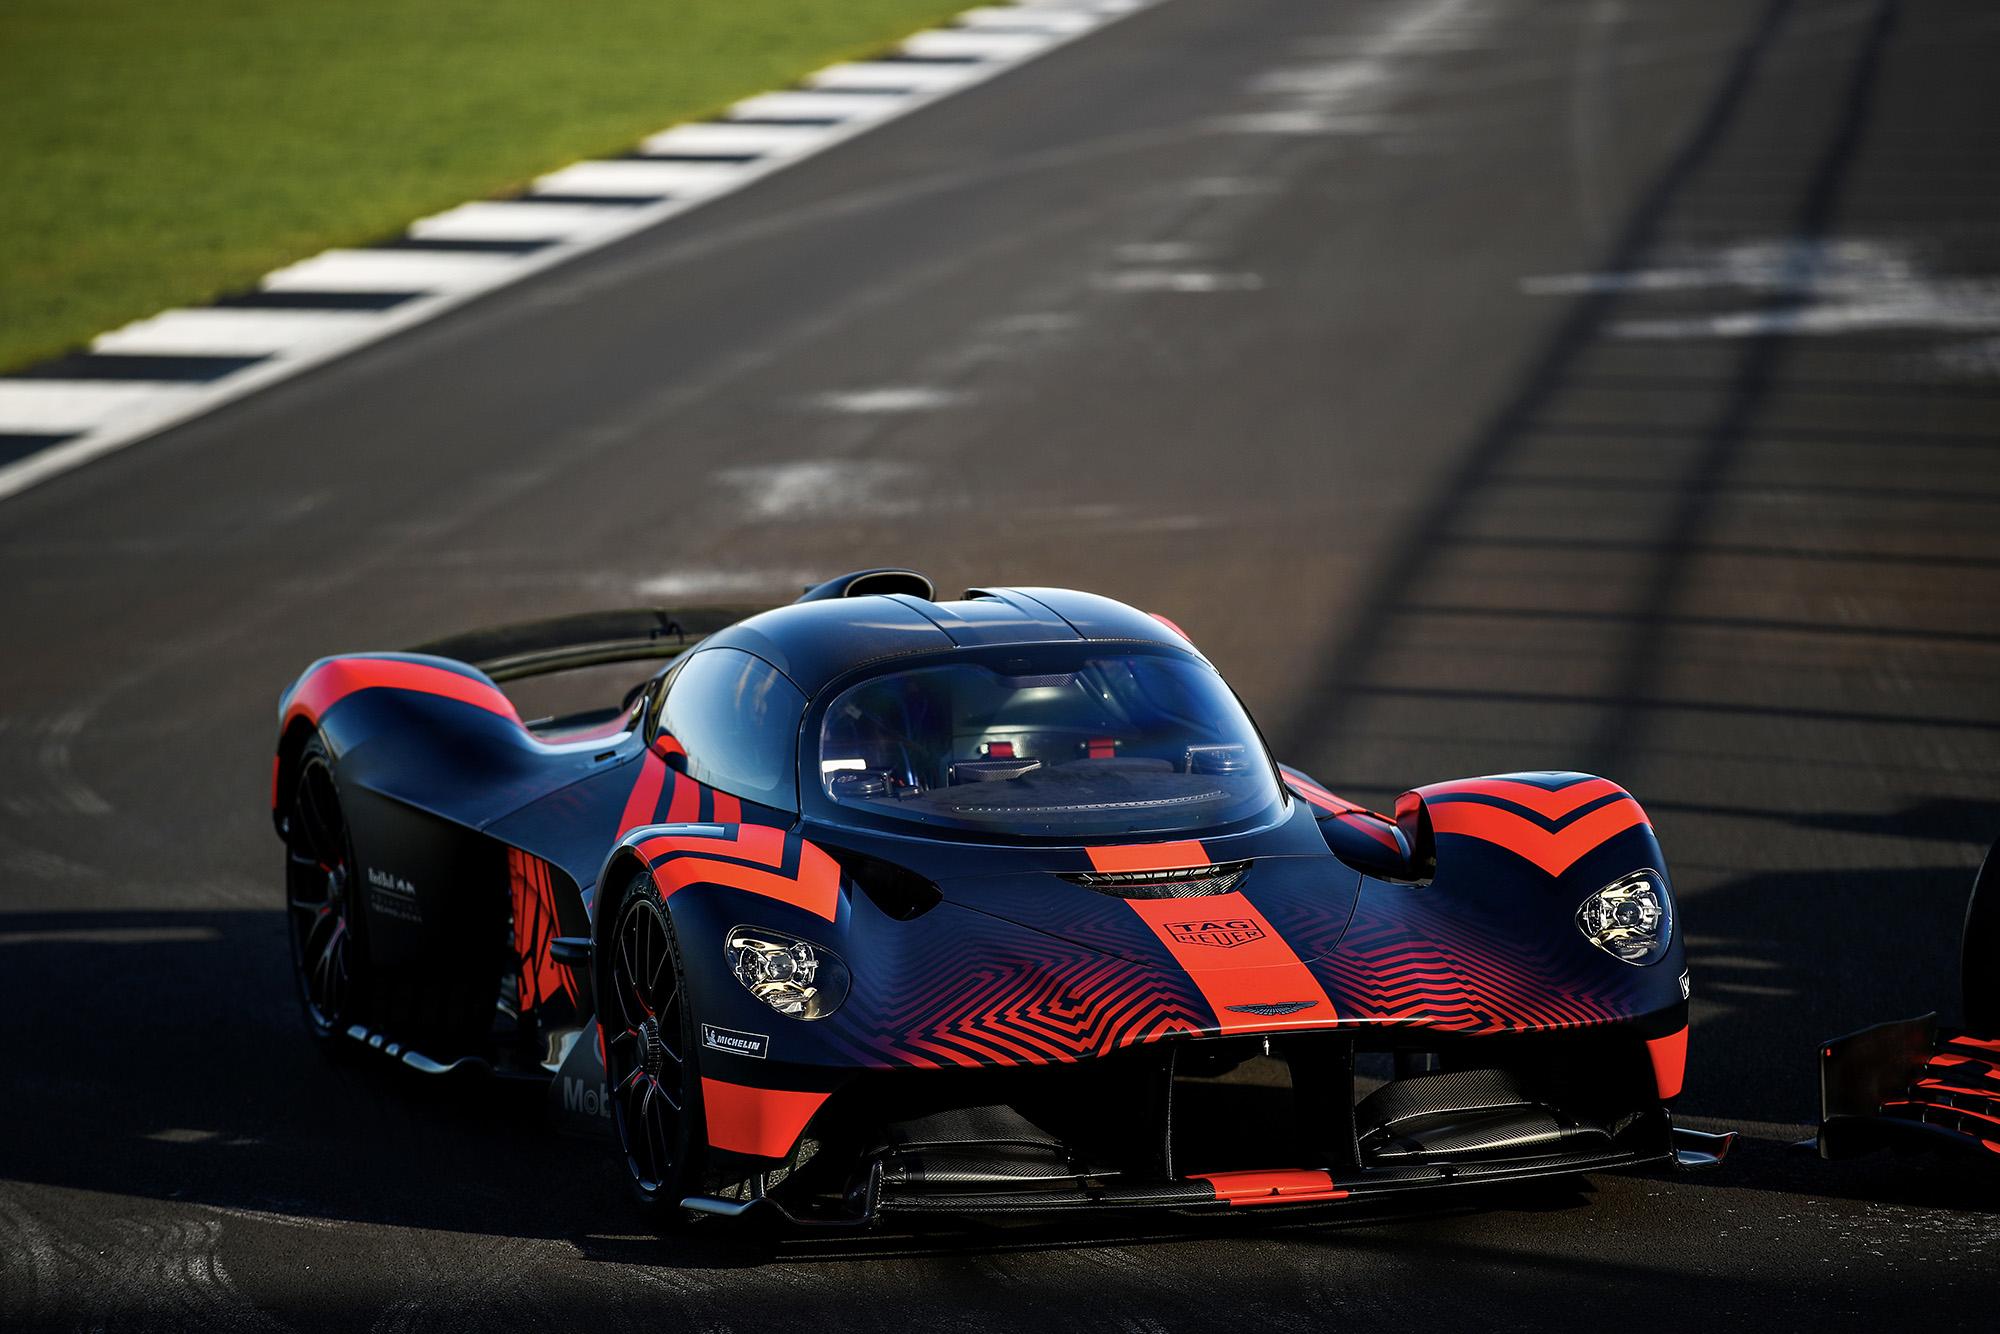 Aston Martin Valkyrie Le Mans Hypercar Put On Hold Motor Sport Magazine